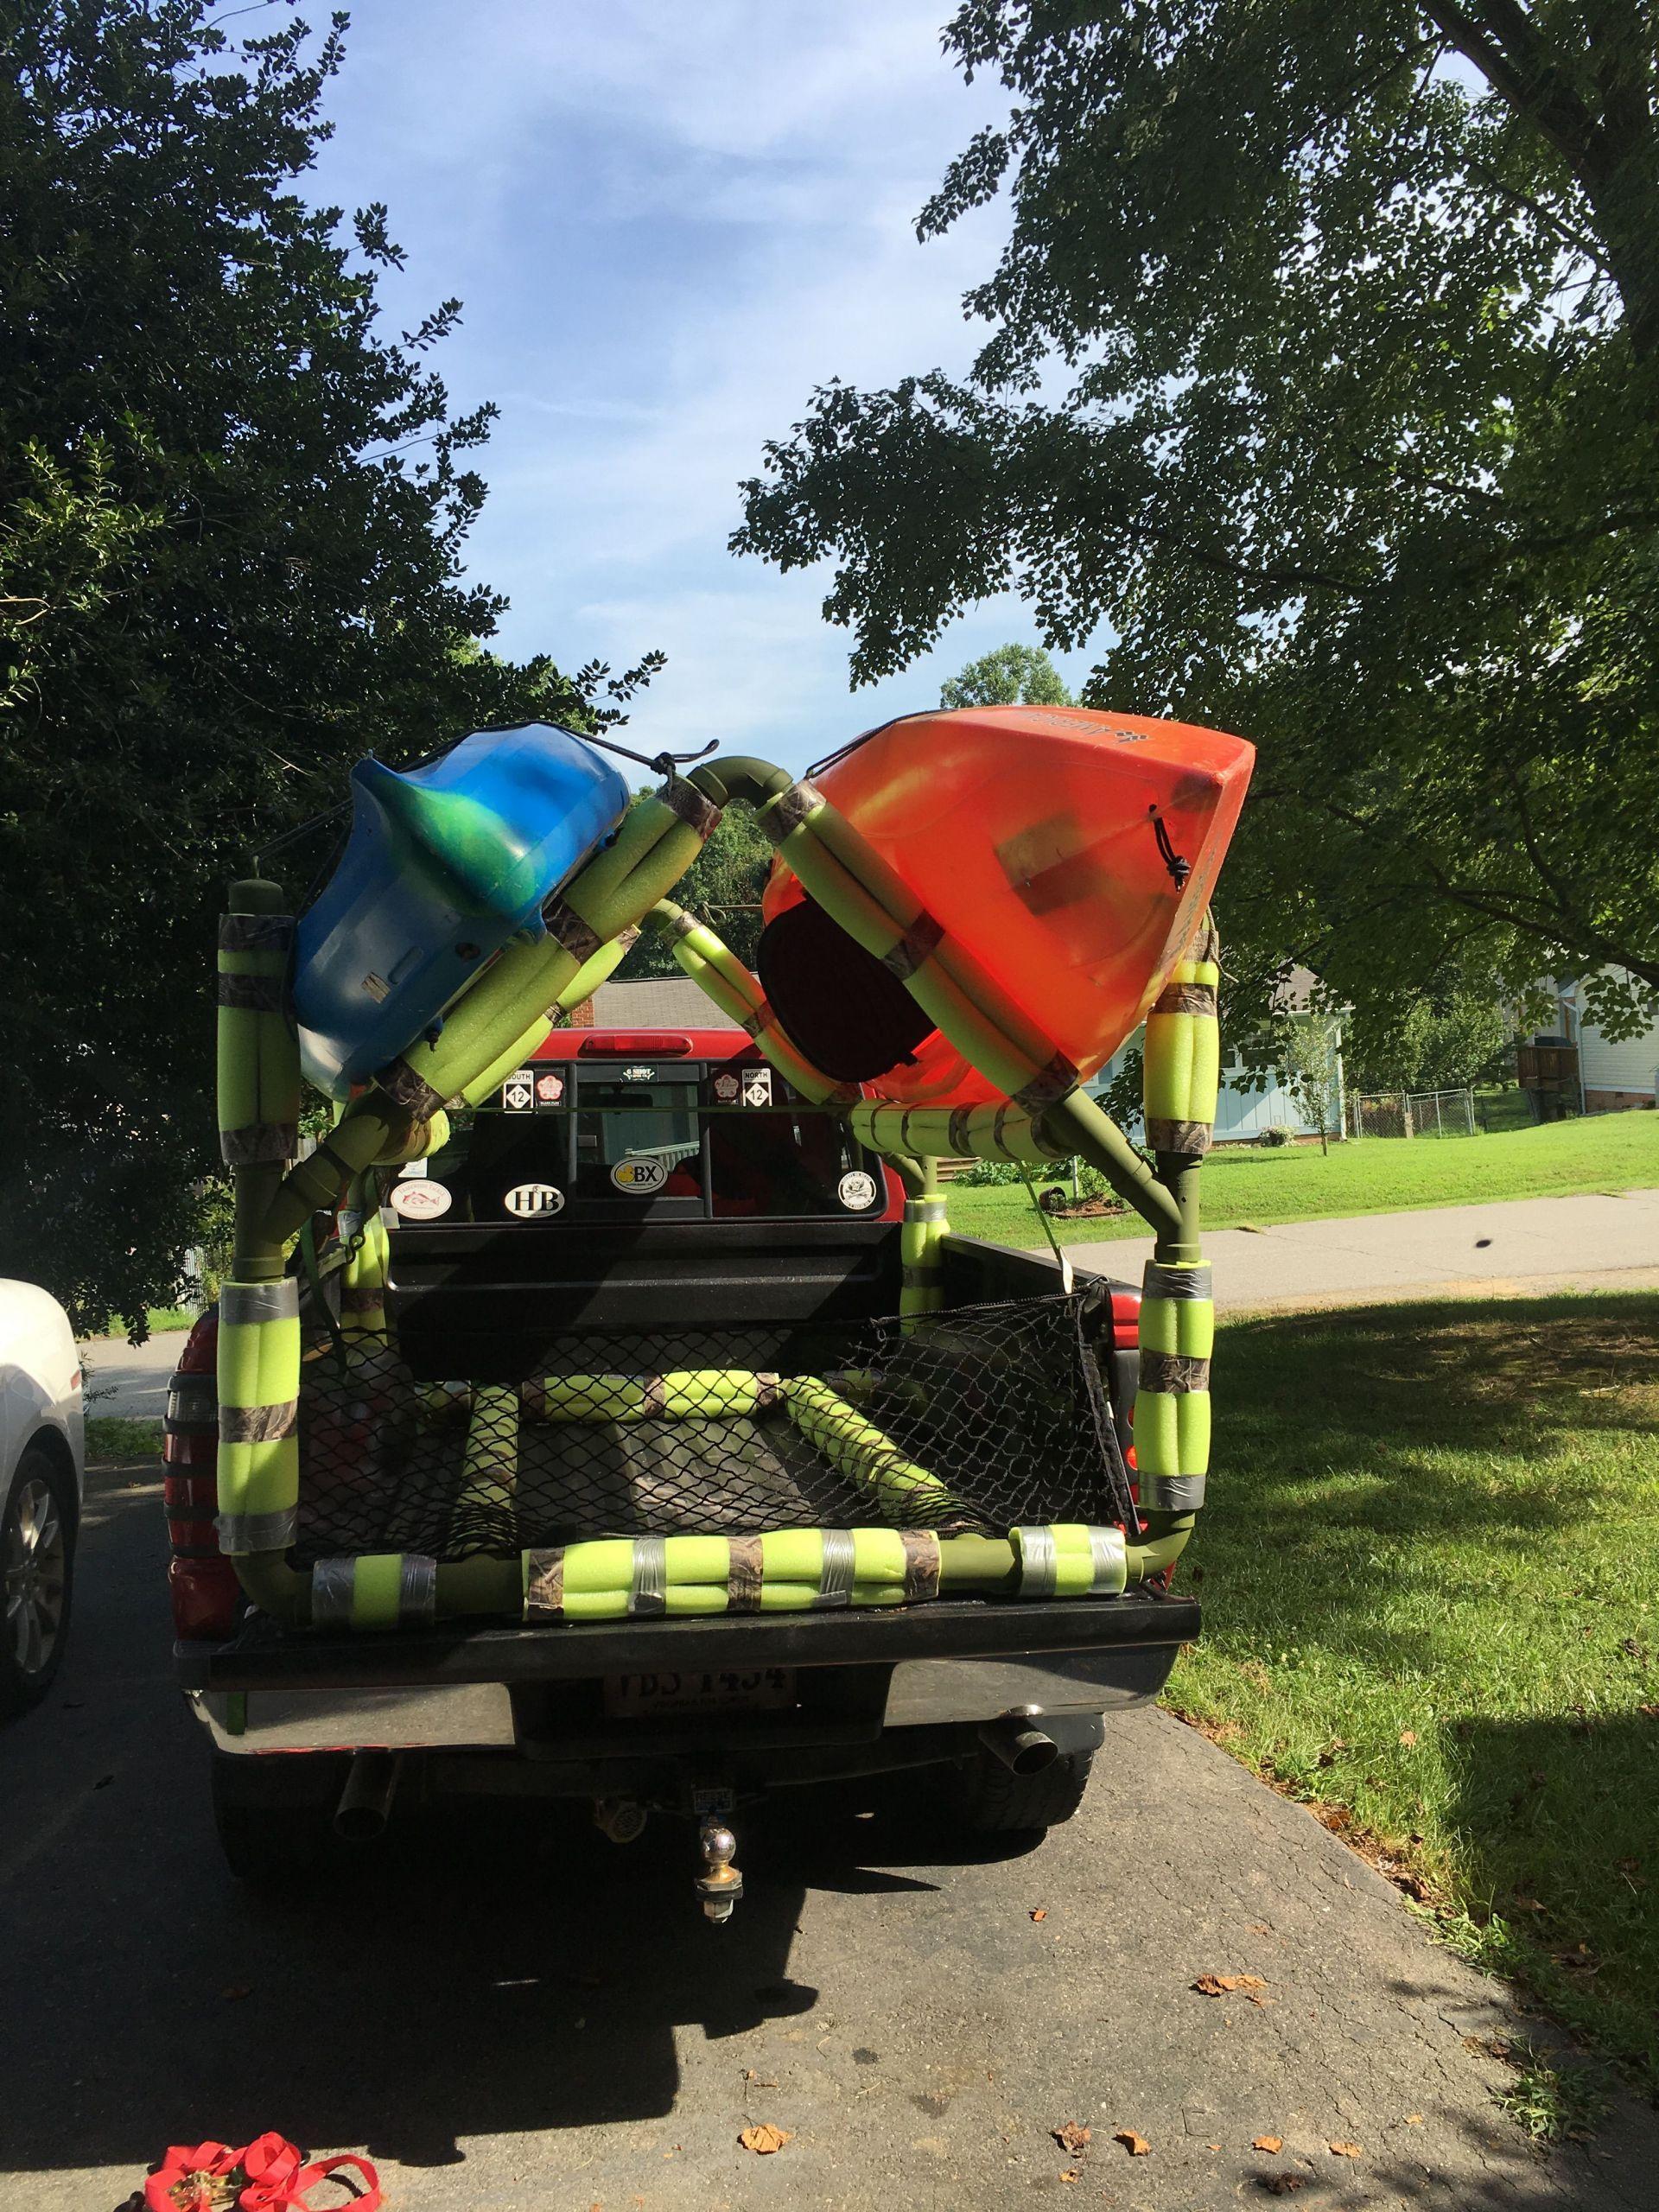 DIY Kayak Rack Pvc  DIY PVC Kayak Rack